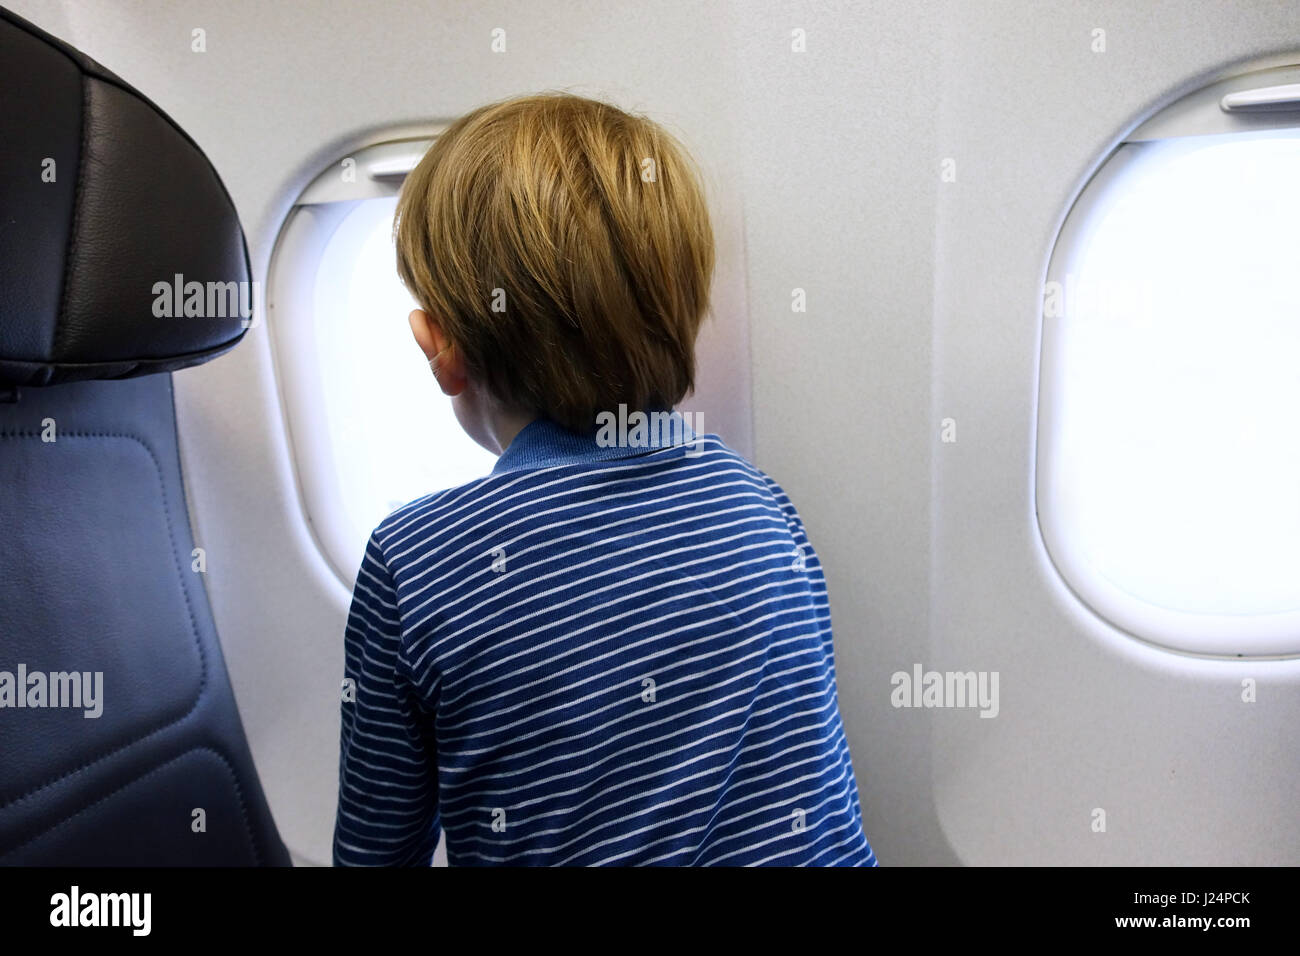 Little boy looking out of aeroplane window - Stock Image